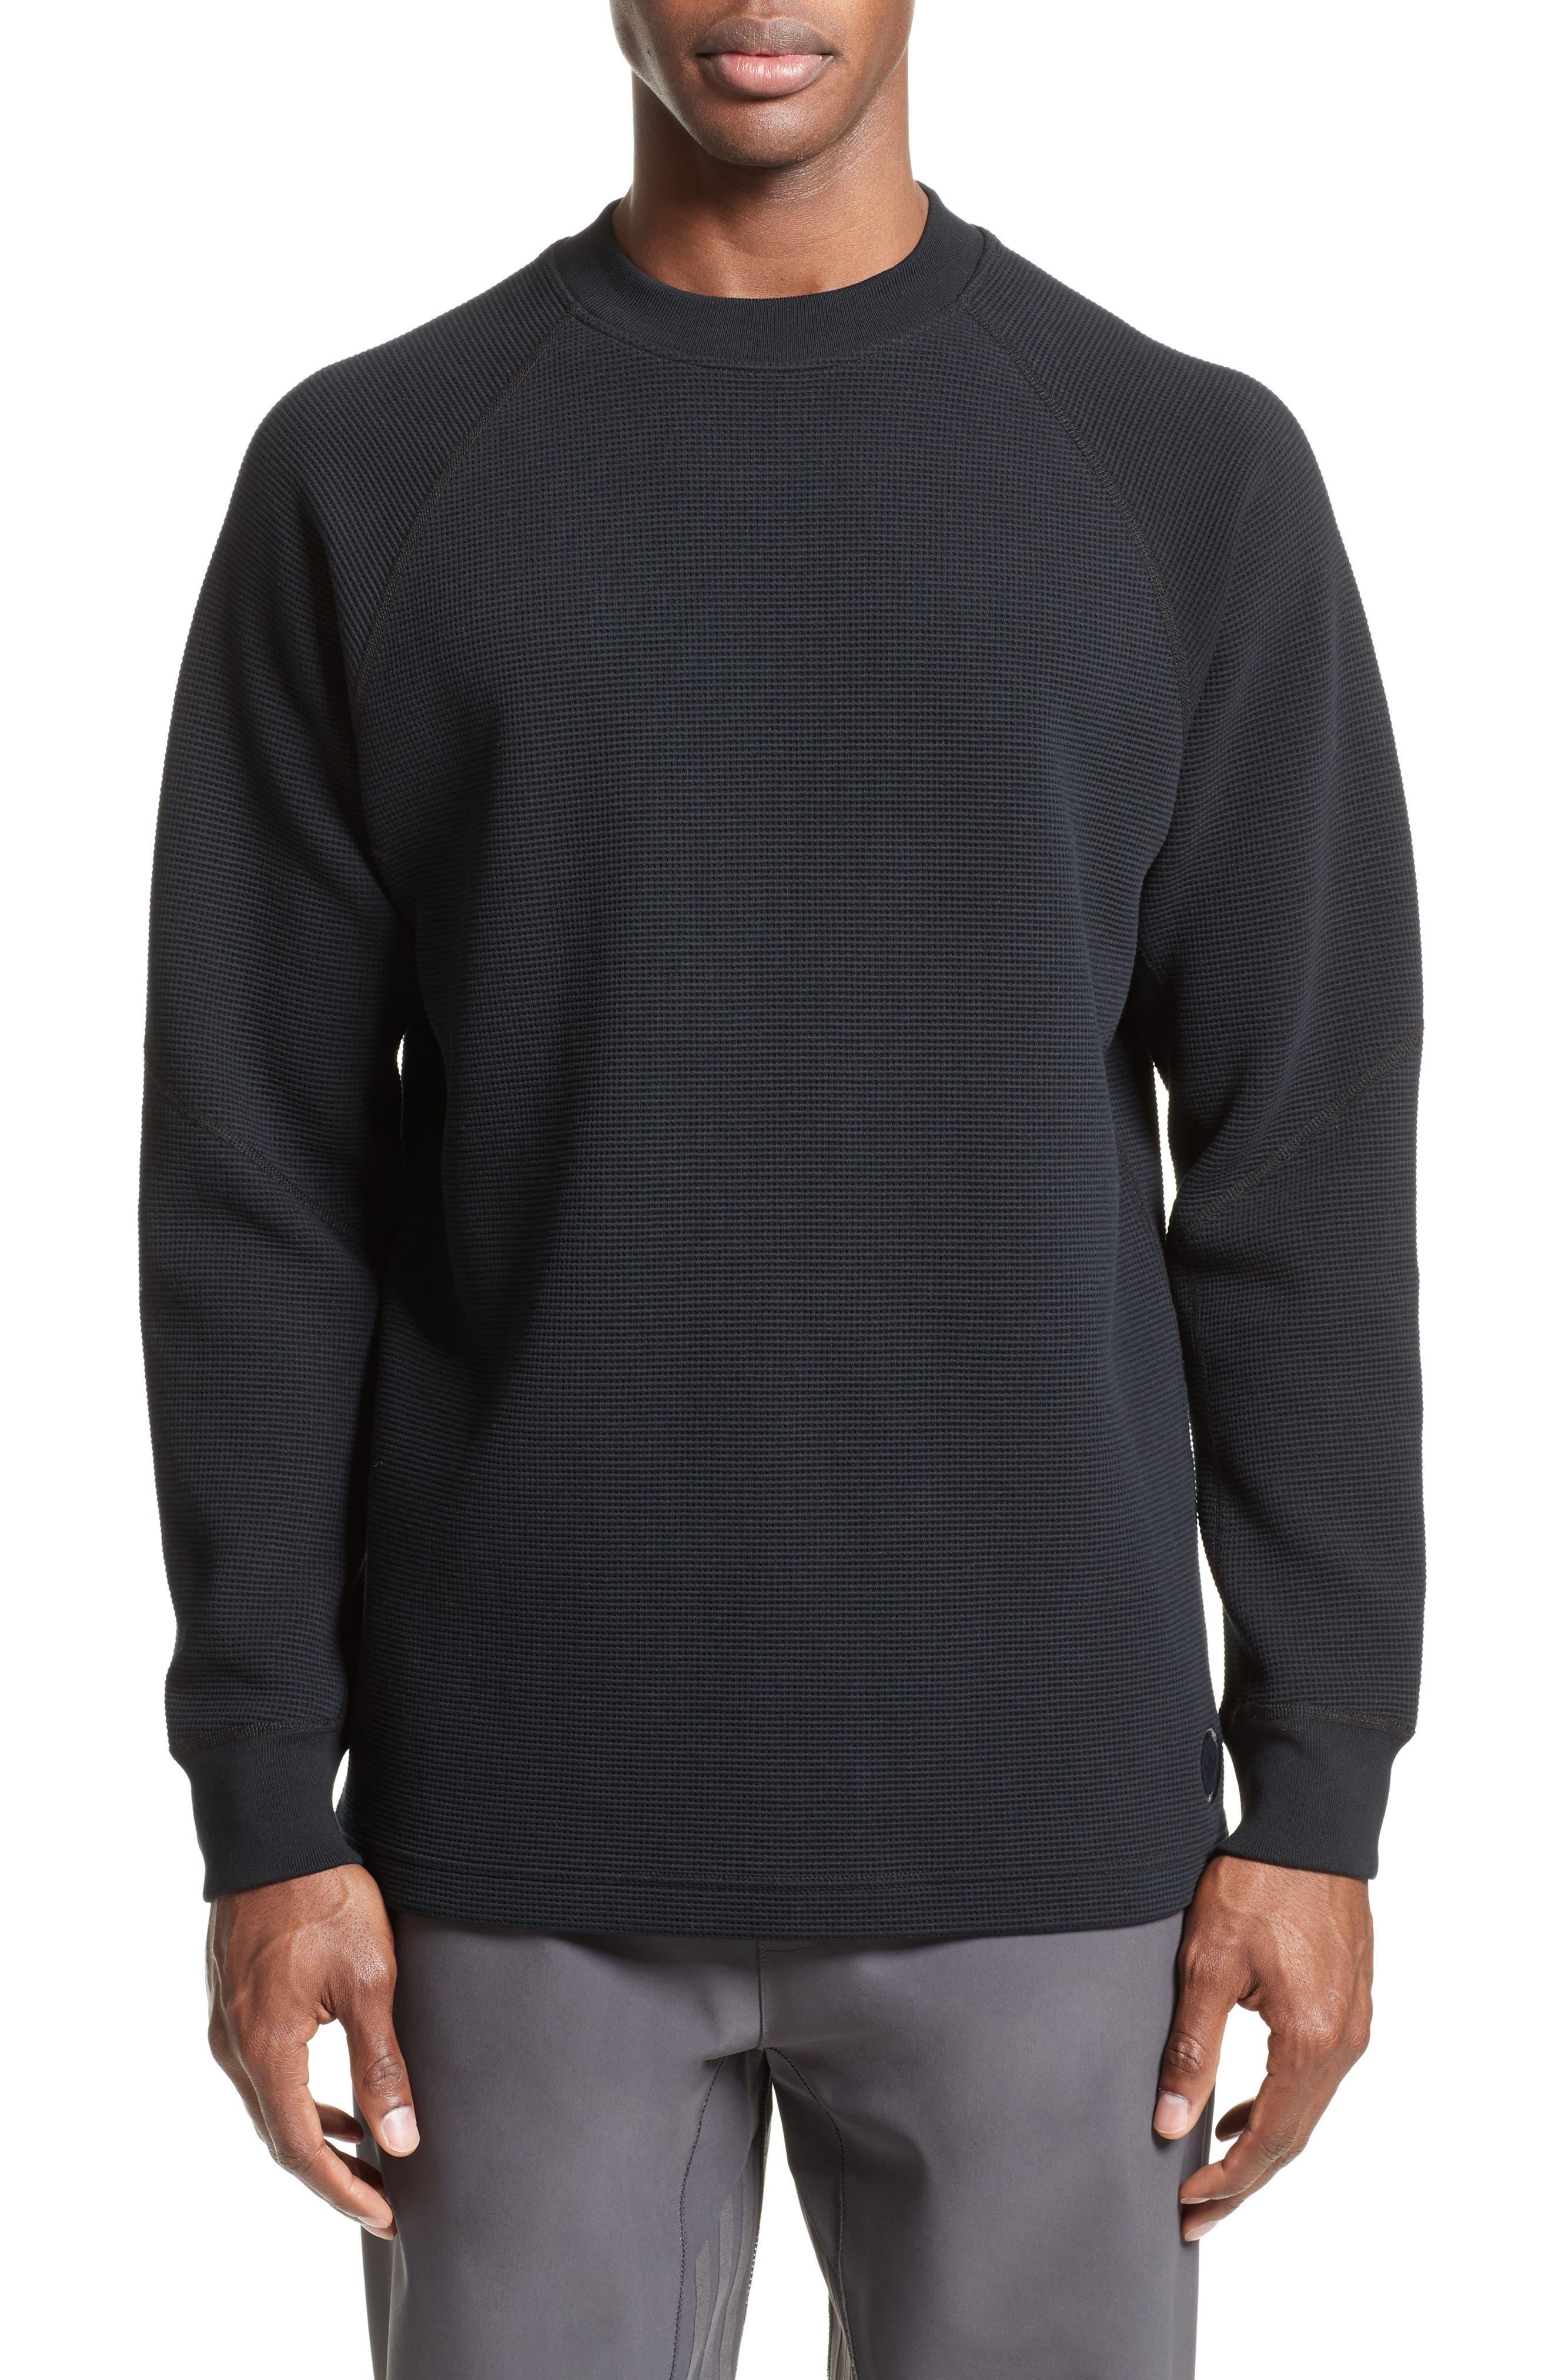 Alternate Image 1 Selected - wings + horns x adidas Fisherman Crewneck Sweatshirt